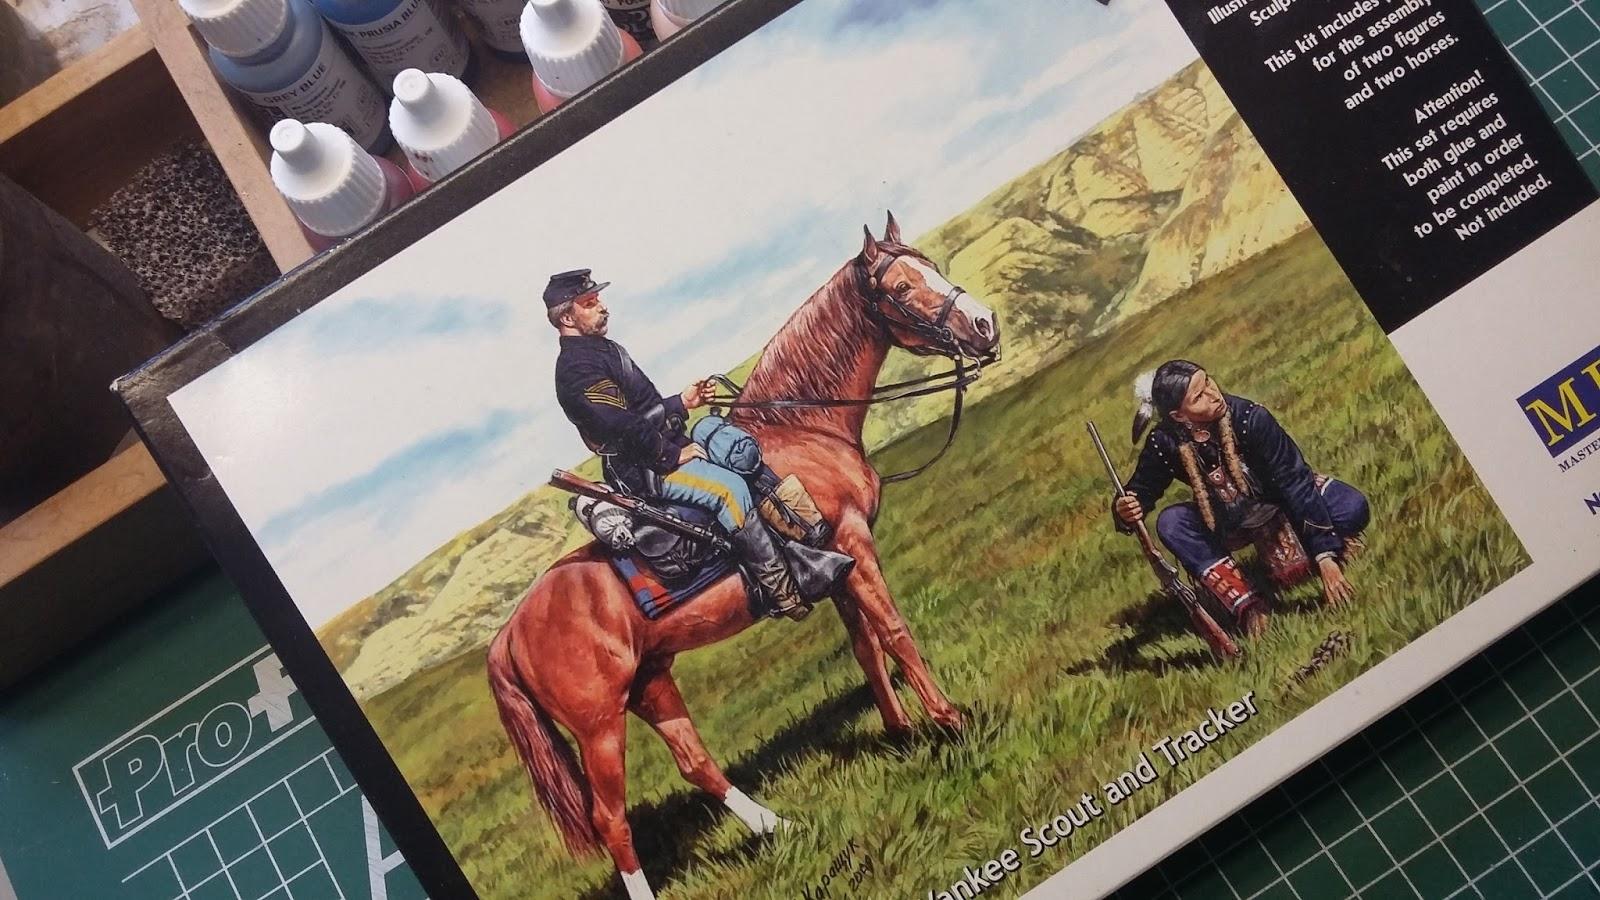 Knabstrupper Poulain Cheval Chevaux 13886 10-3-1 Schleich Horse Club